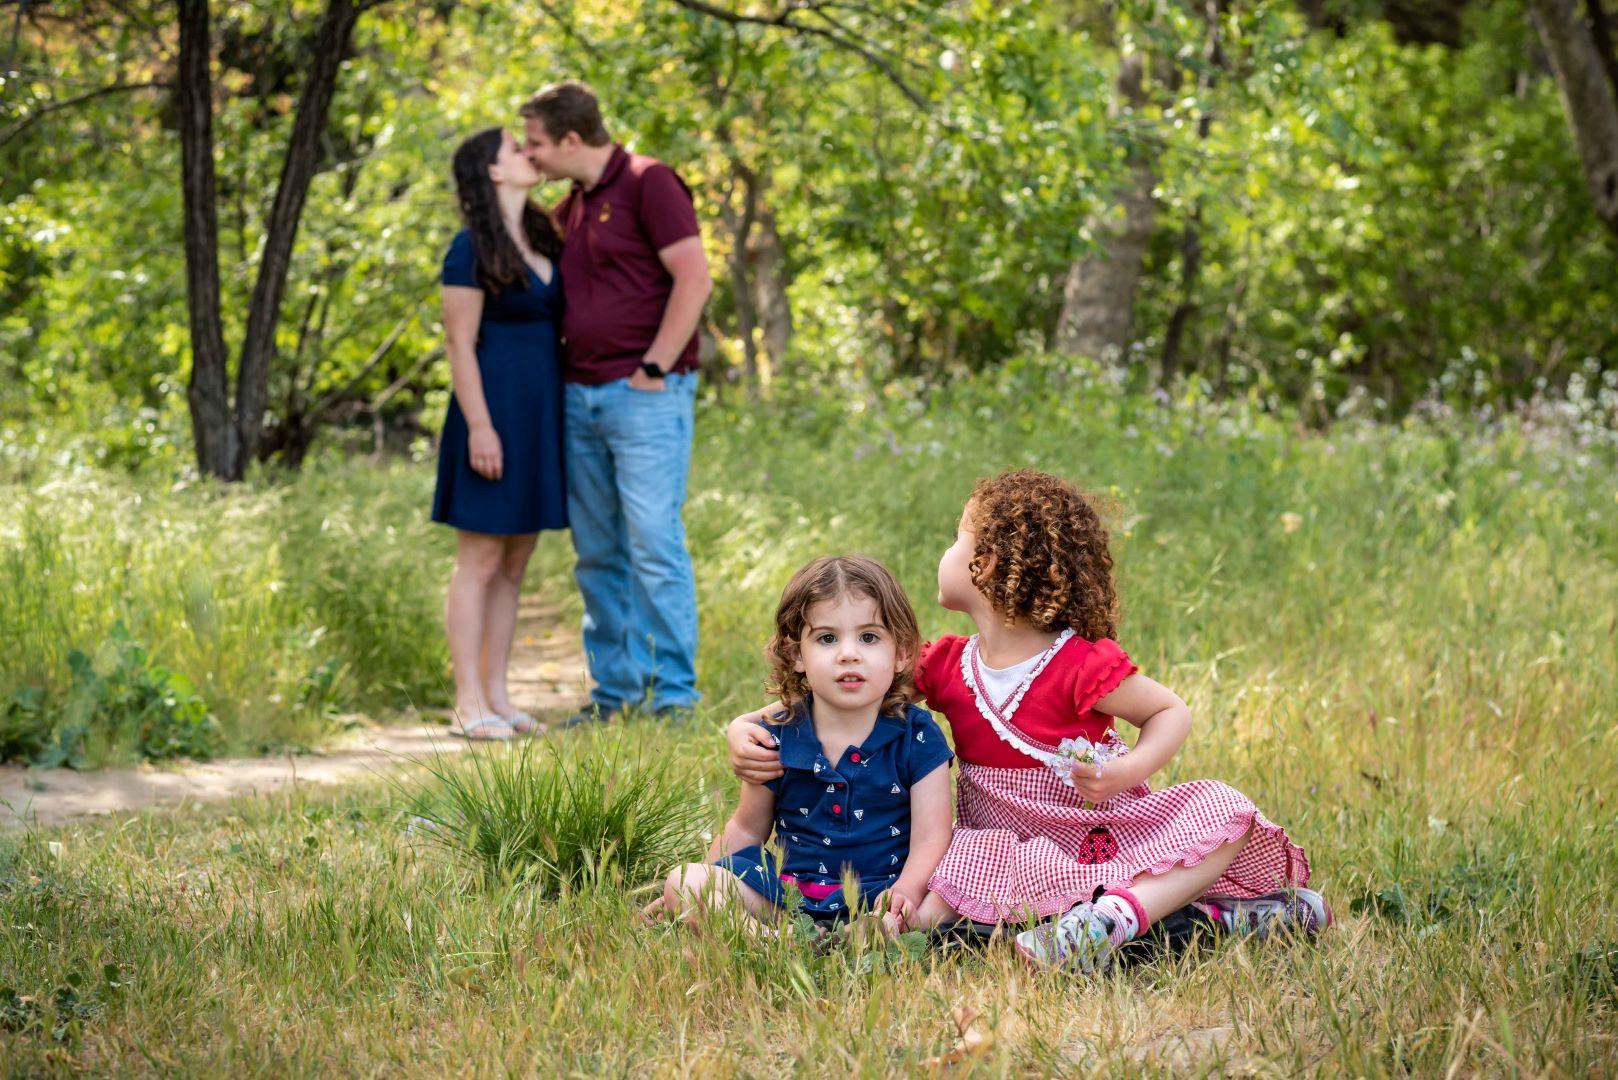 neilson family photography cupertino bay area mcclellan ranch kiss